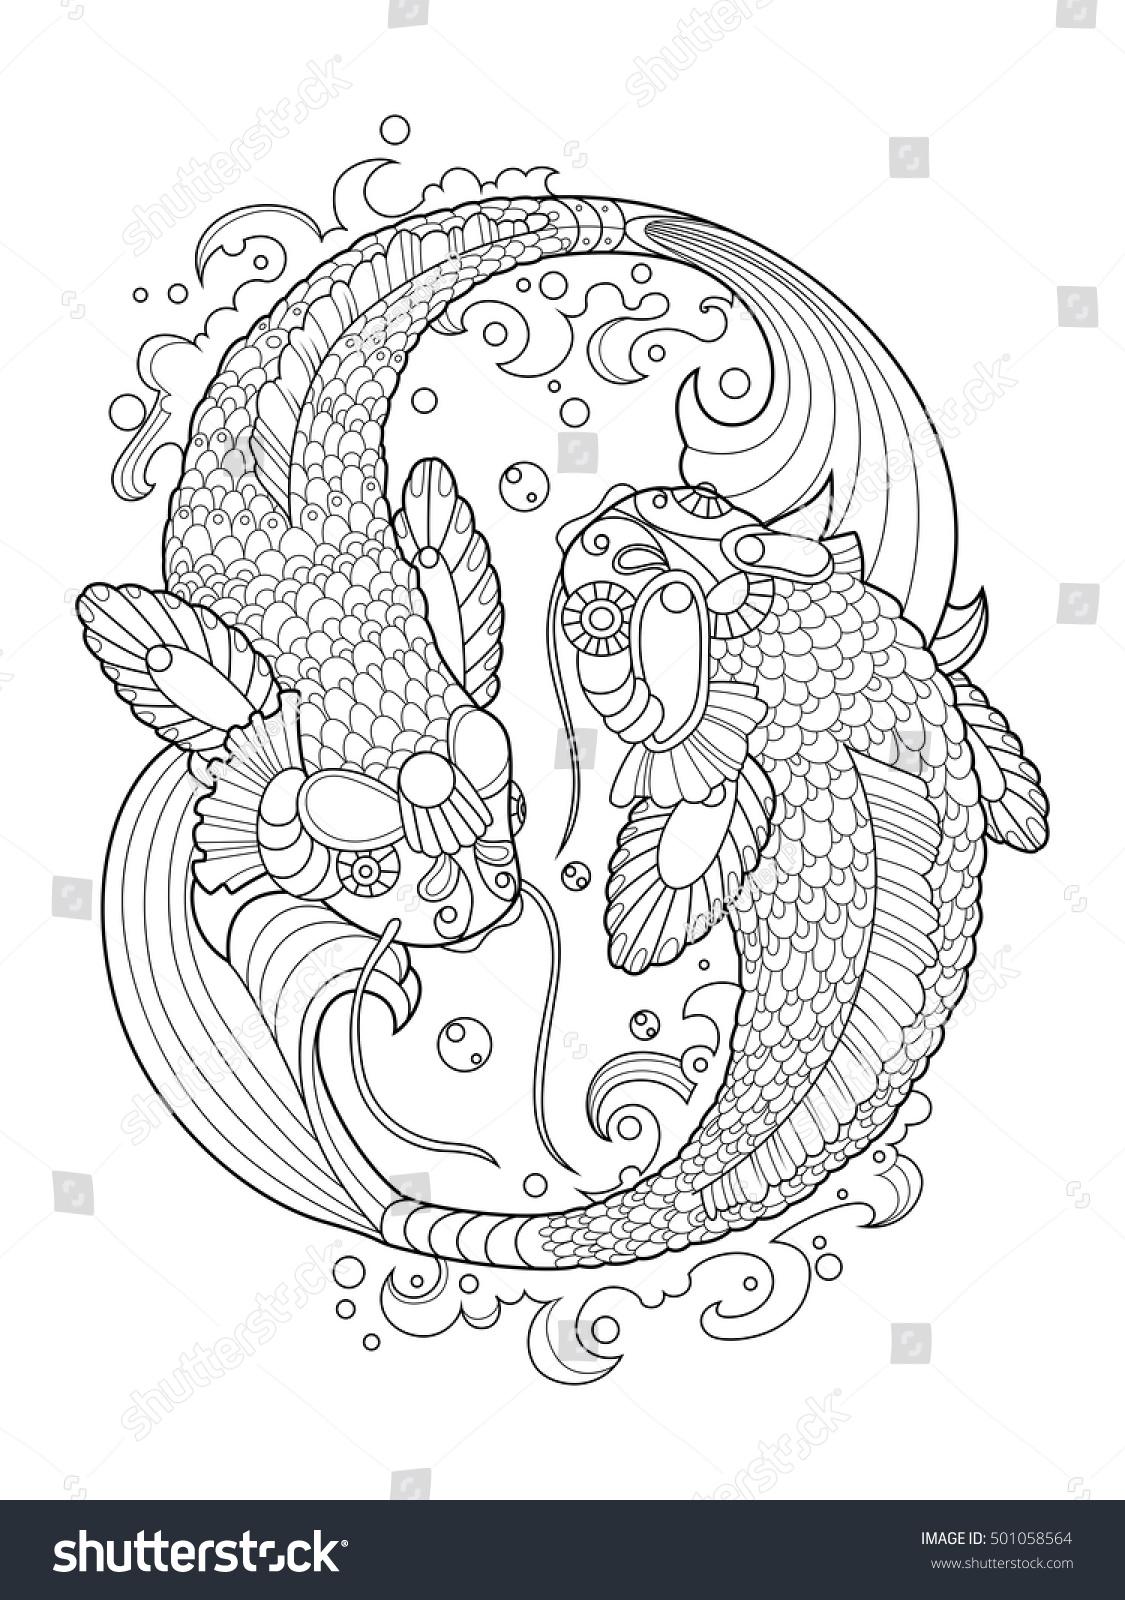 Koi Carp Fish Coloring Book For Adults Vector Illustration Anti Stress Adult